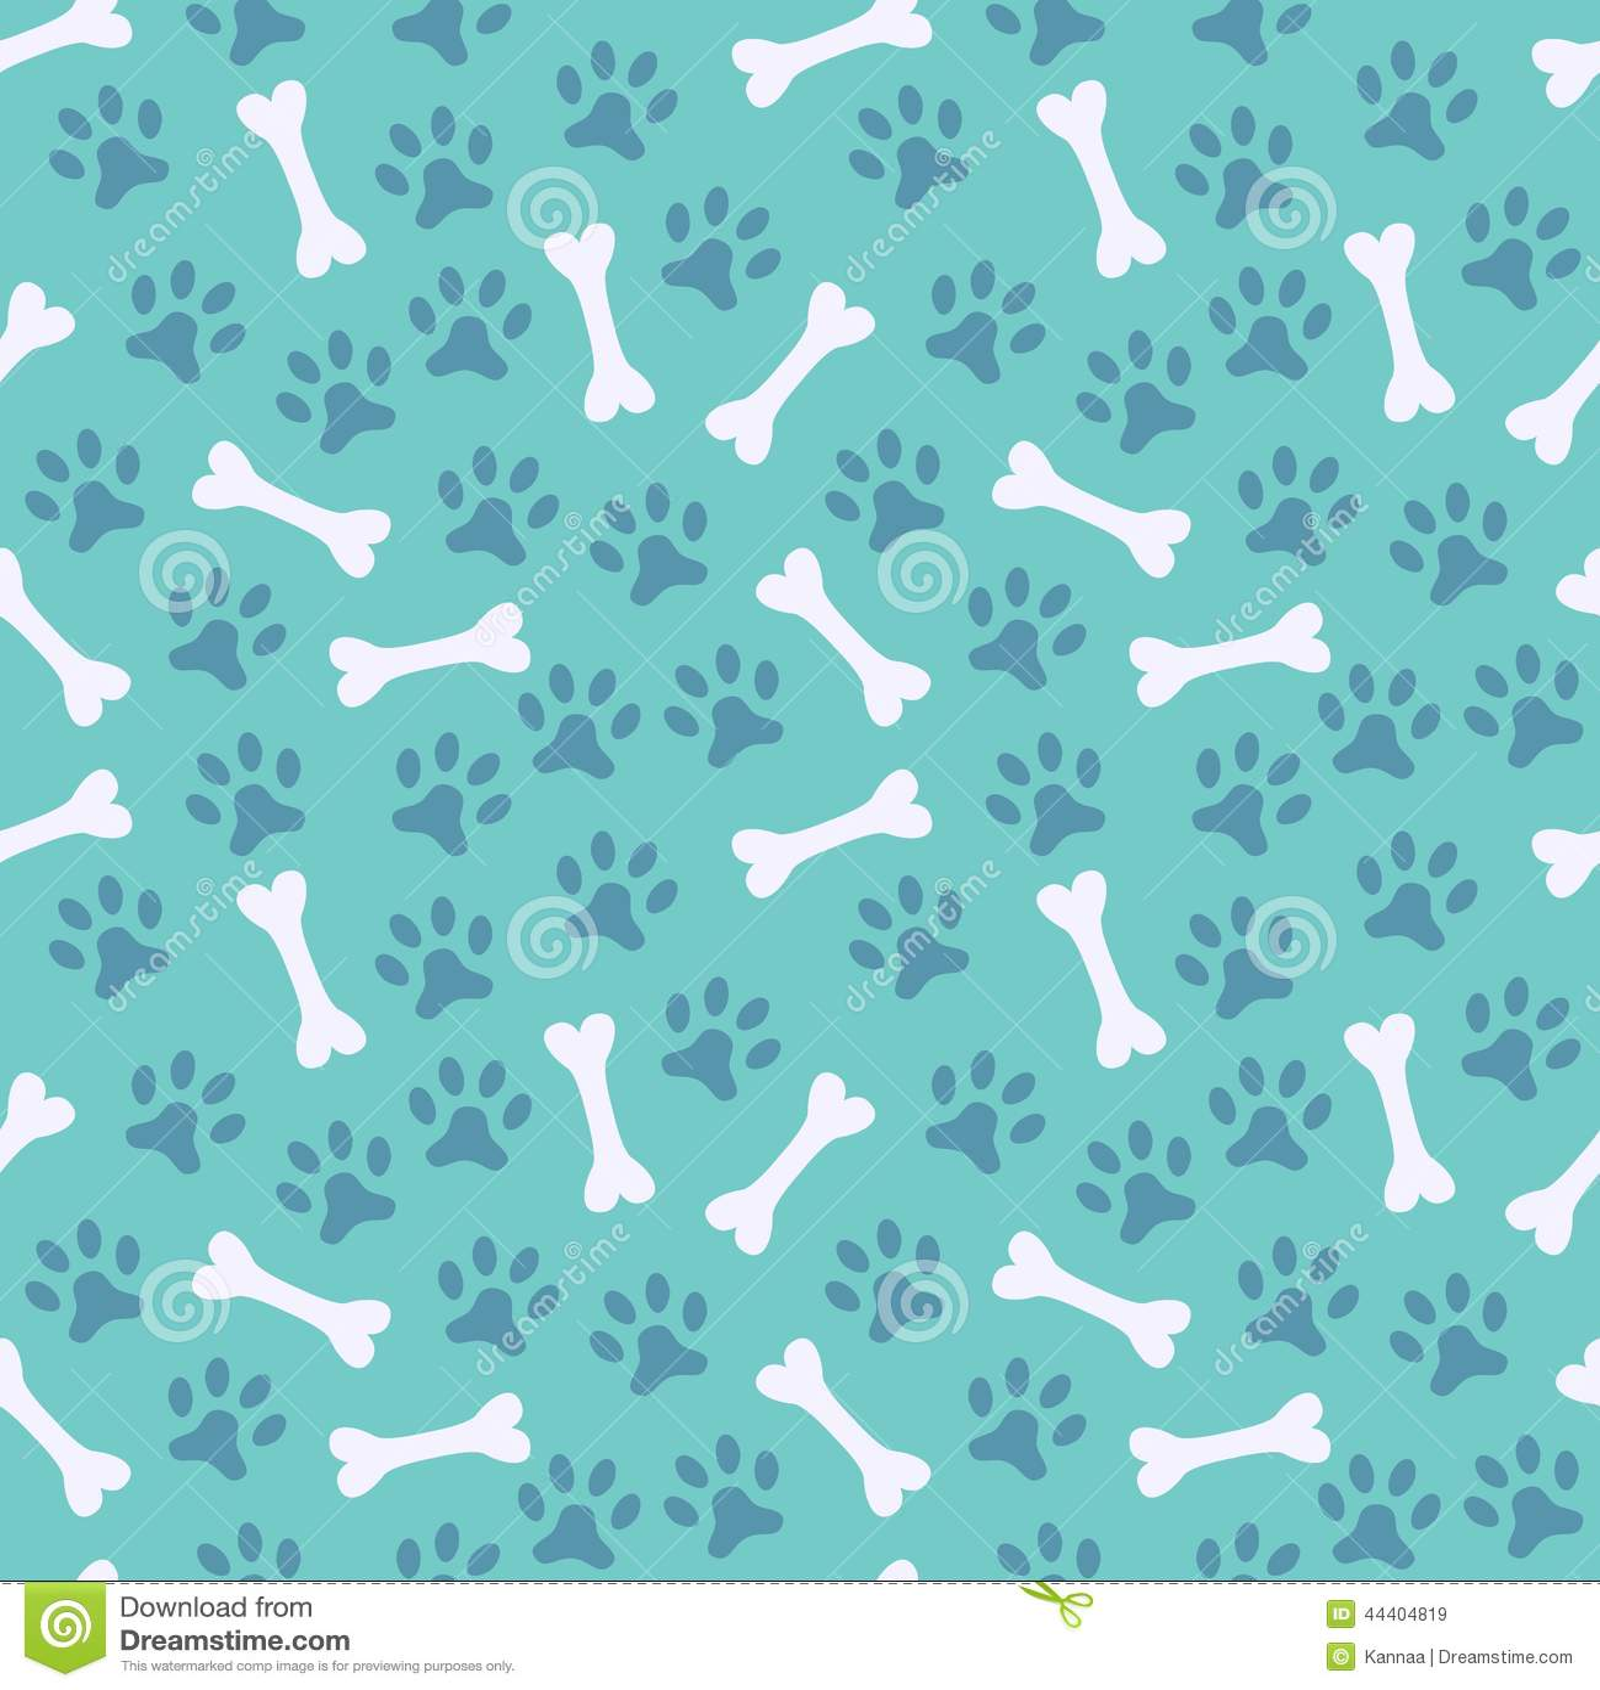 Animal Seamless Vector Pattern Of Paw Footprint Stock